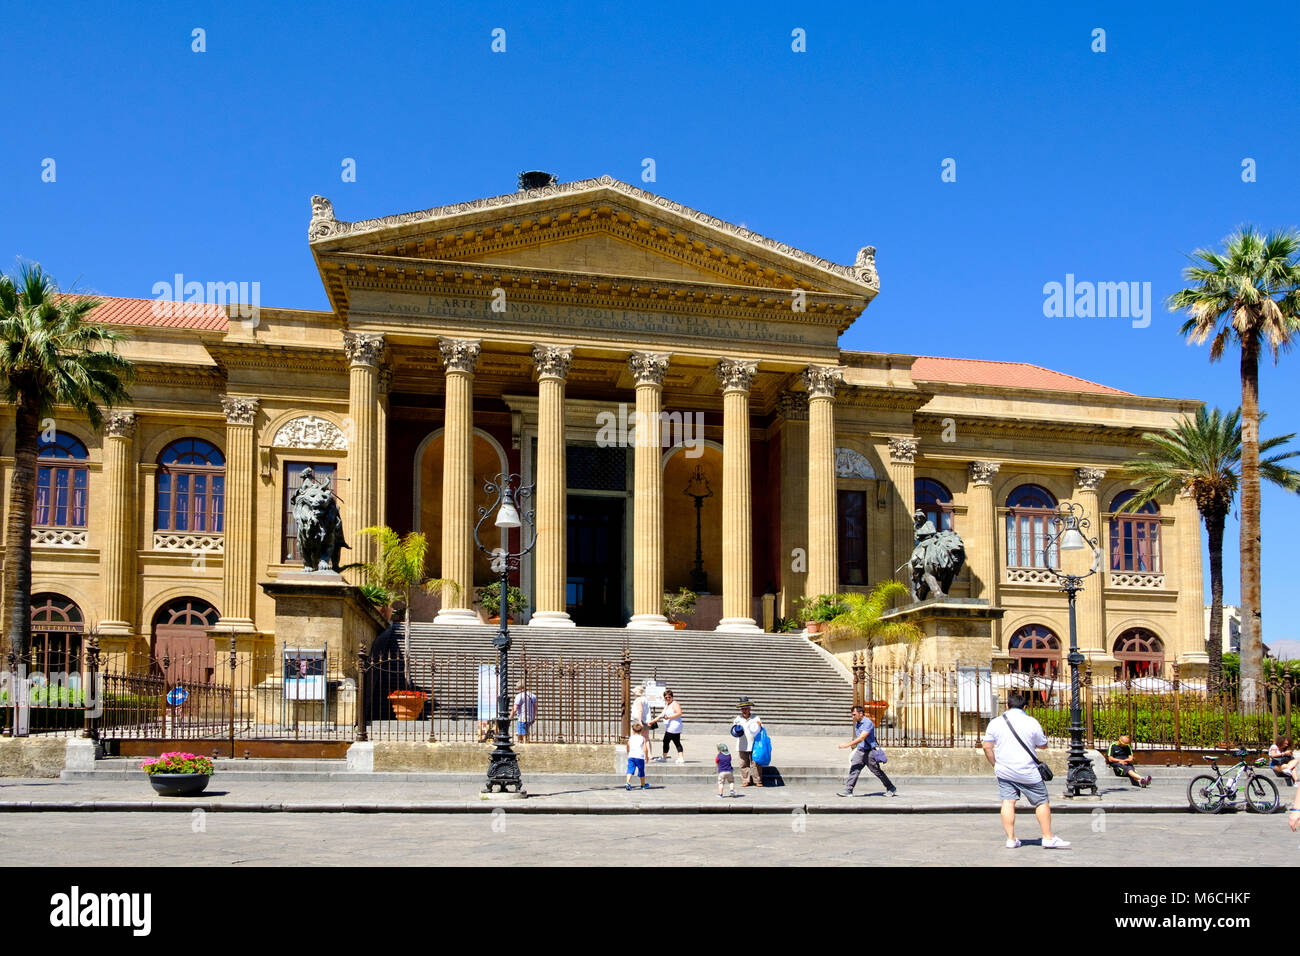 Opera House Teatro Massimo, Palermo, Sicily, Italy Stock Photo ...